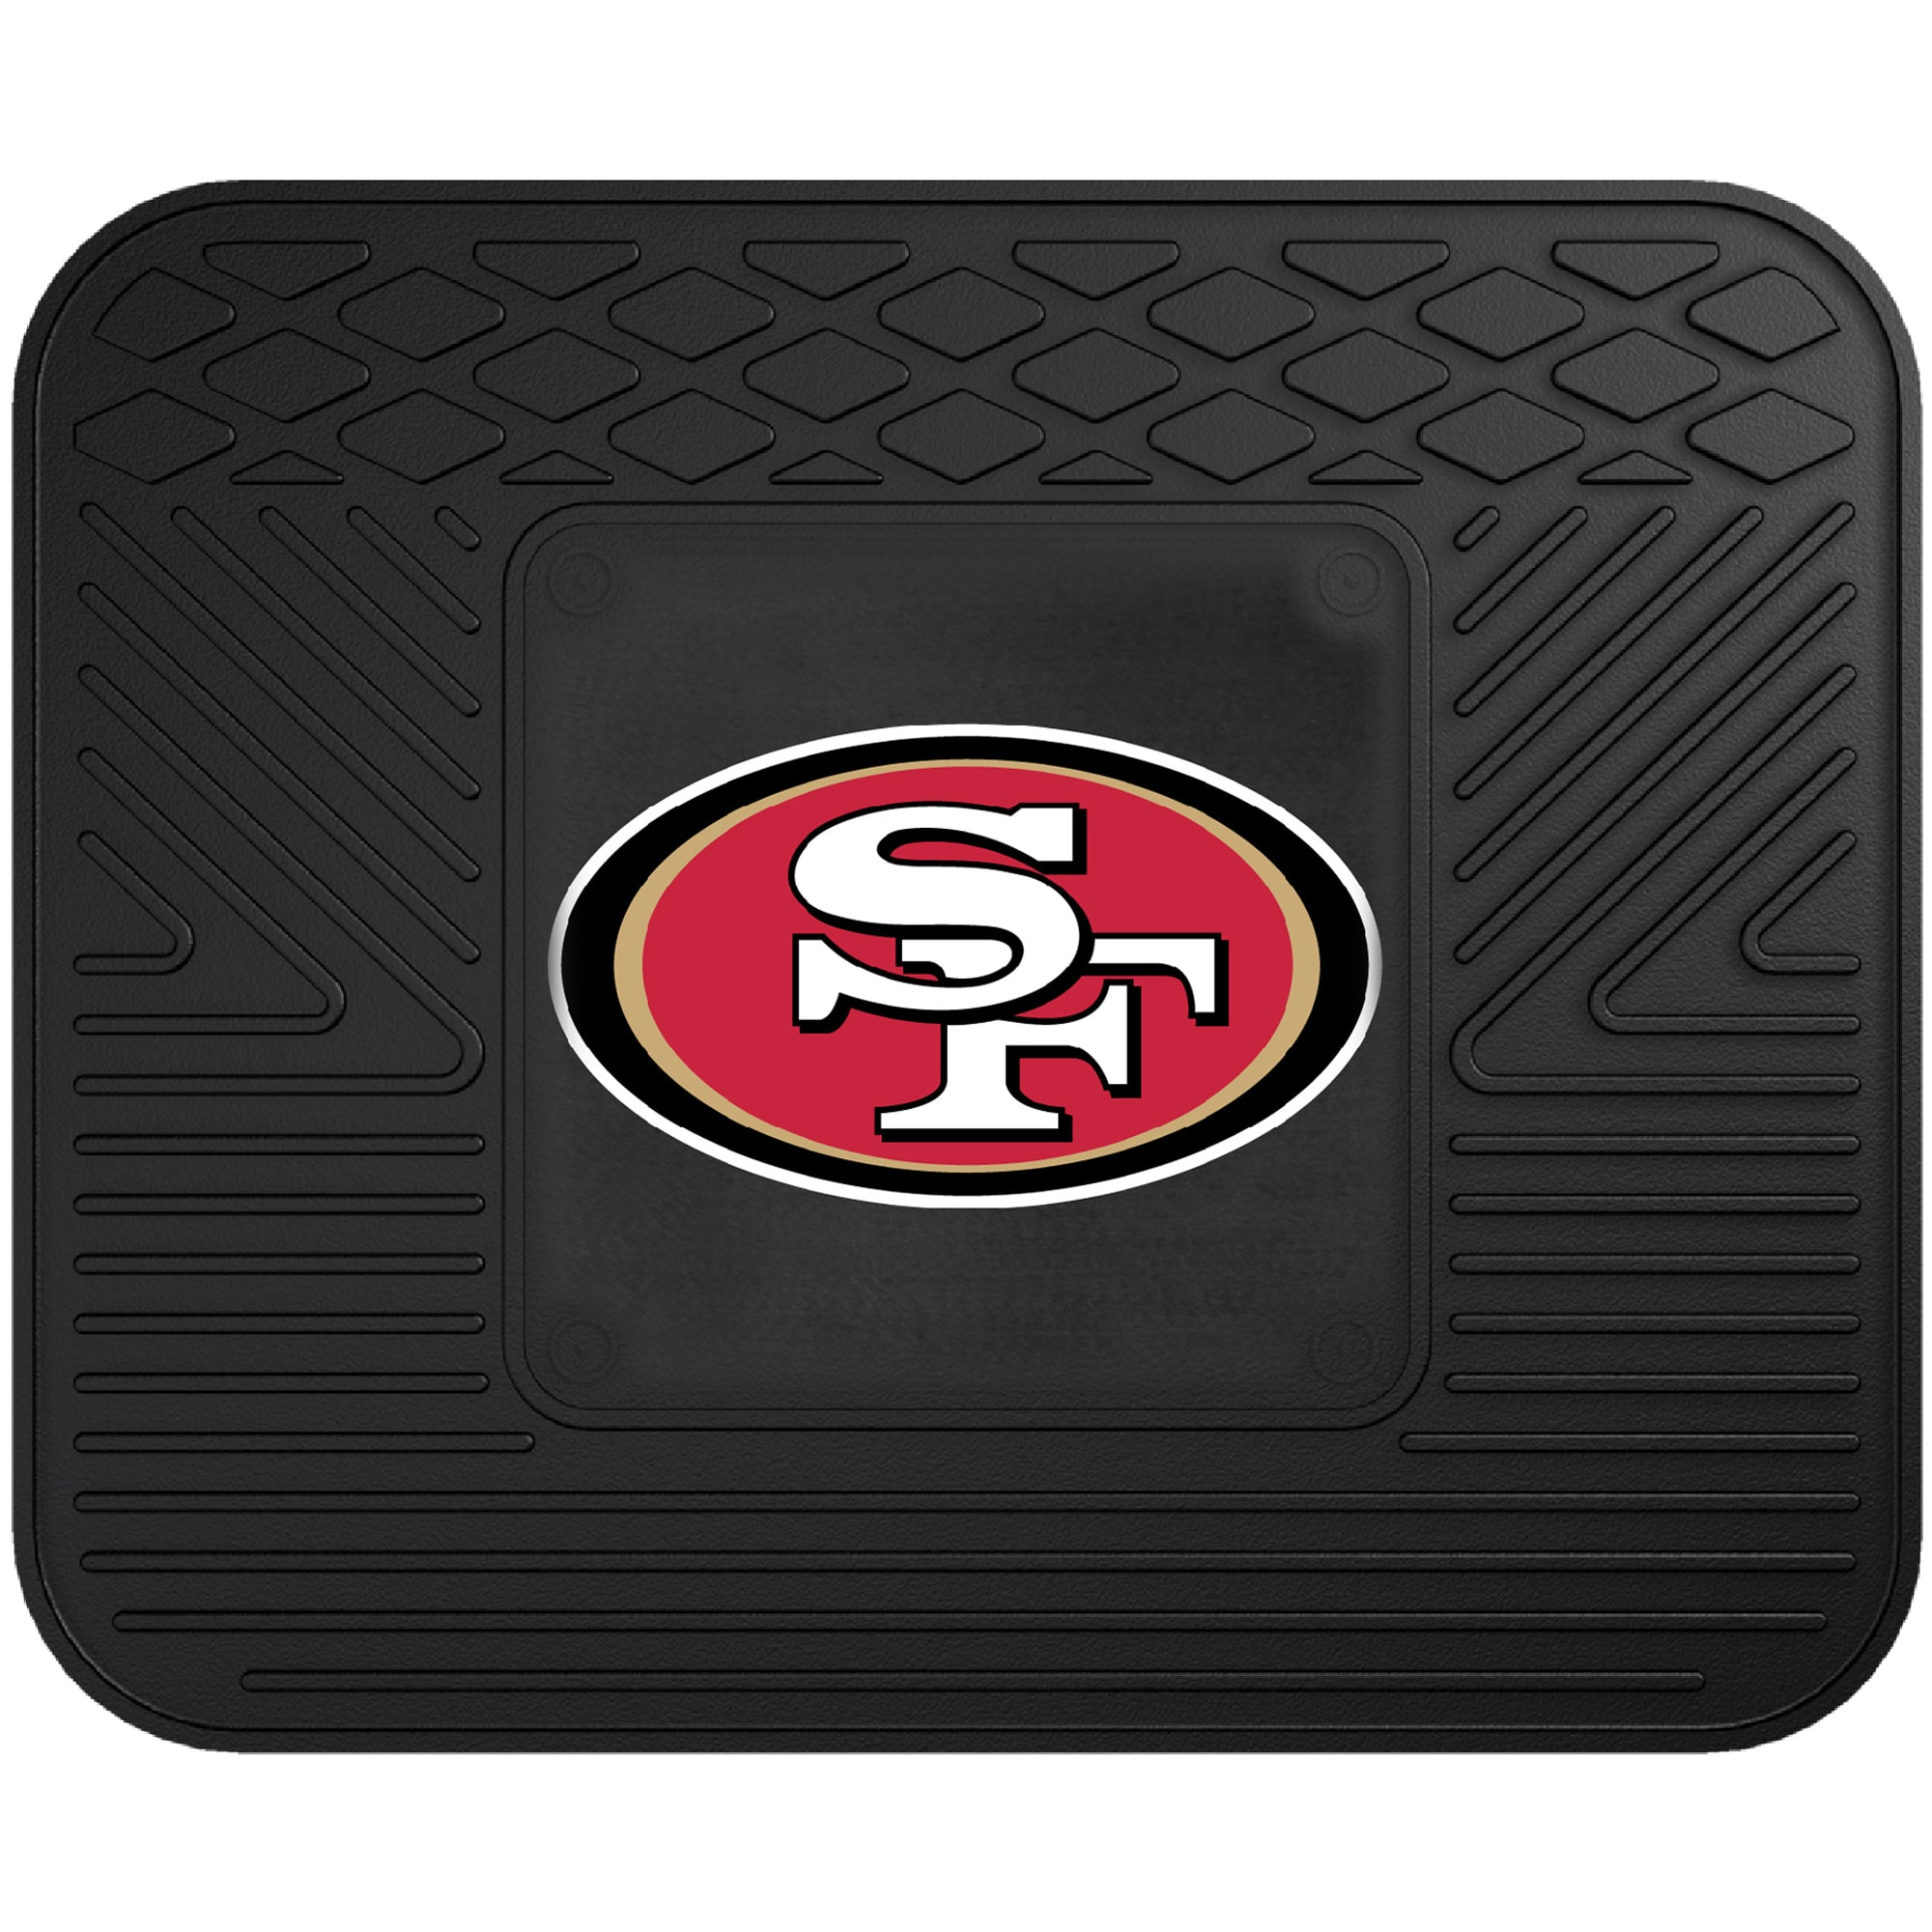 "San Francisco 49ers 17"" x 14"" Utility Mat"